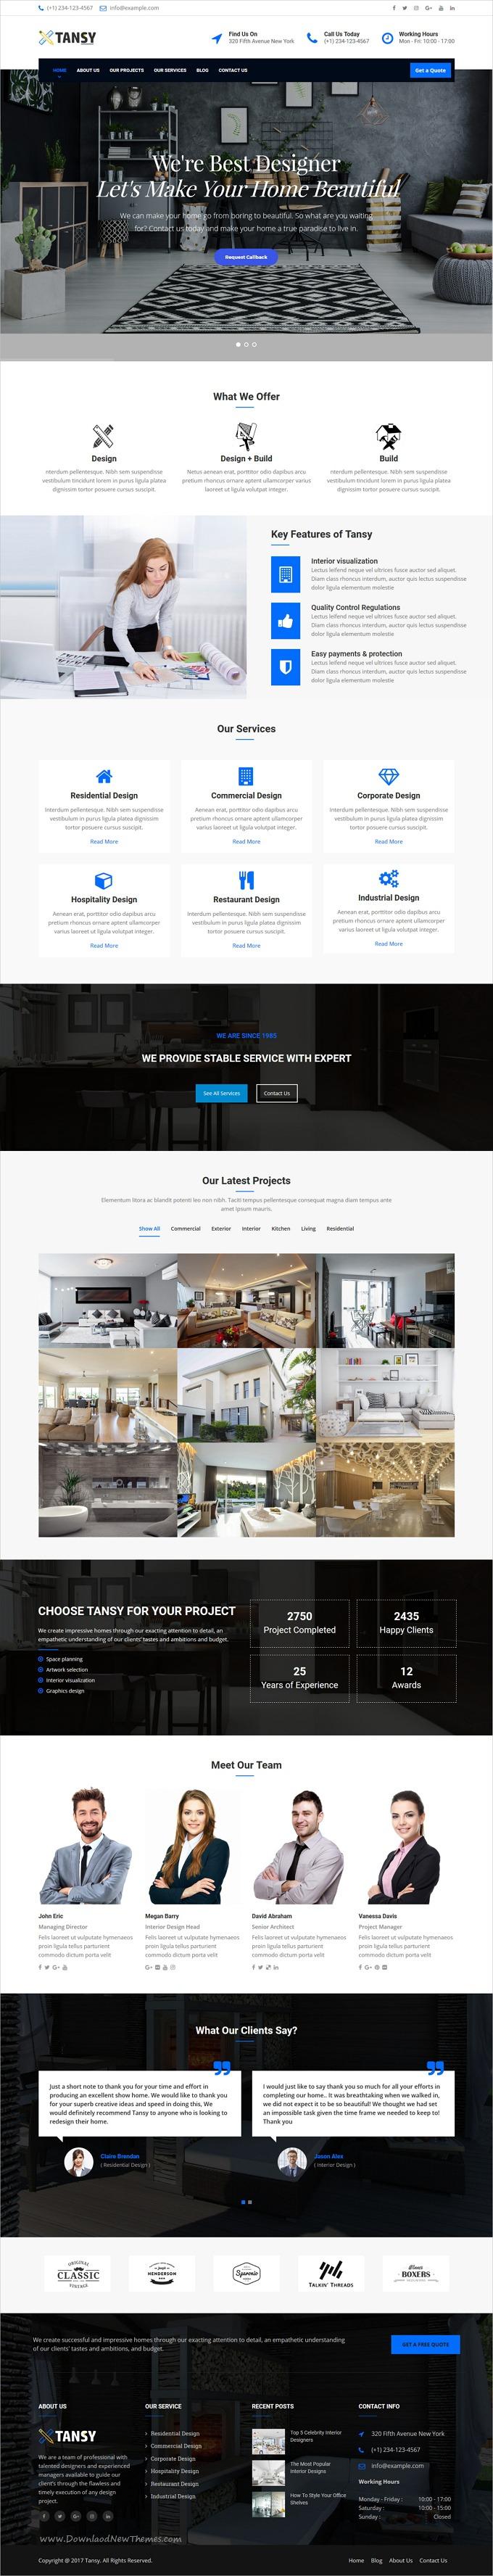 Tansy - Minimal Interior Design Agency WP Theme | Pinterest | Design ...